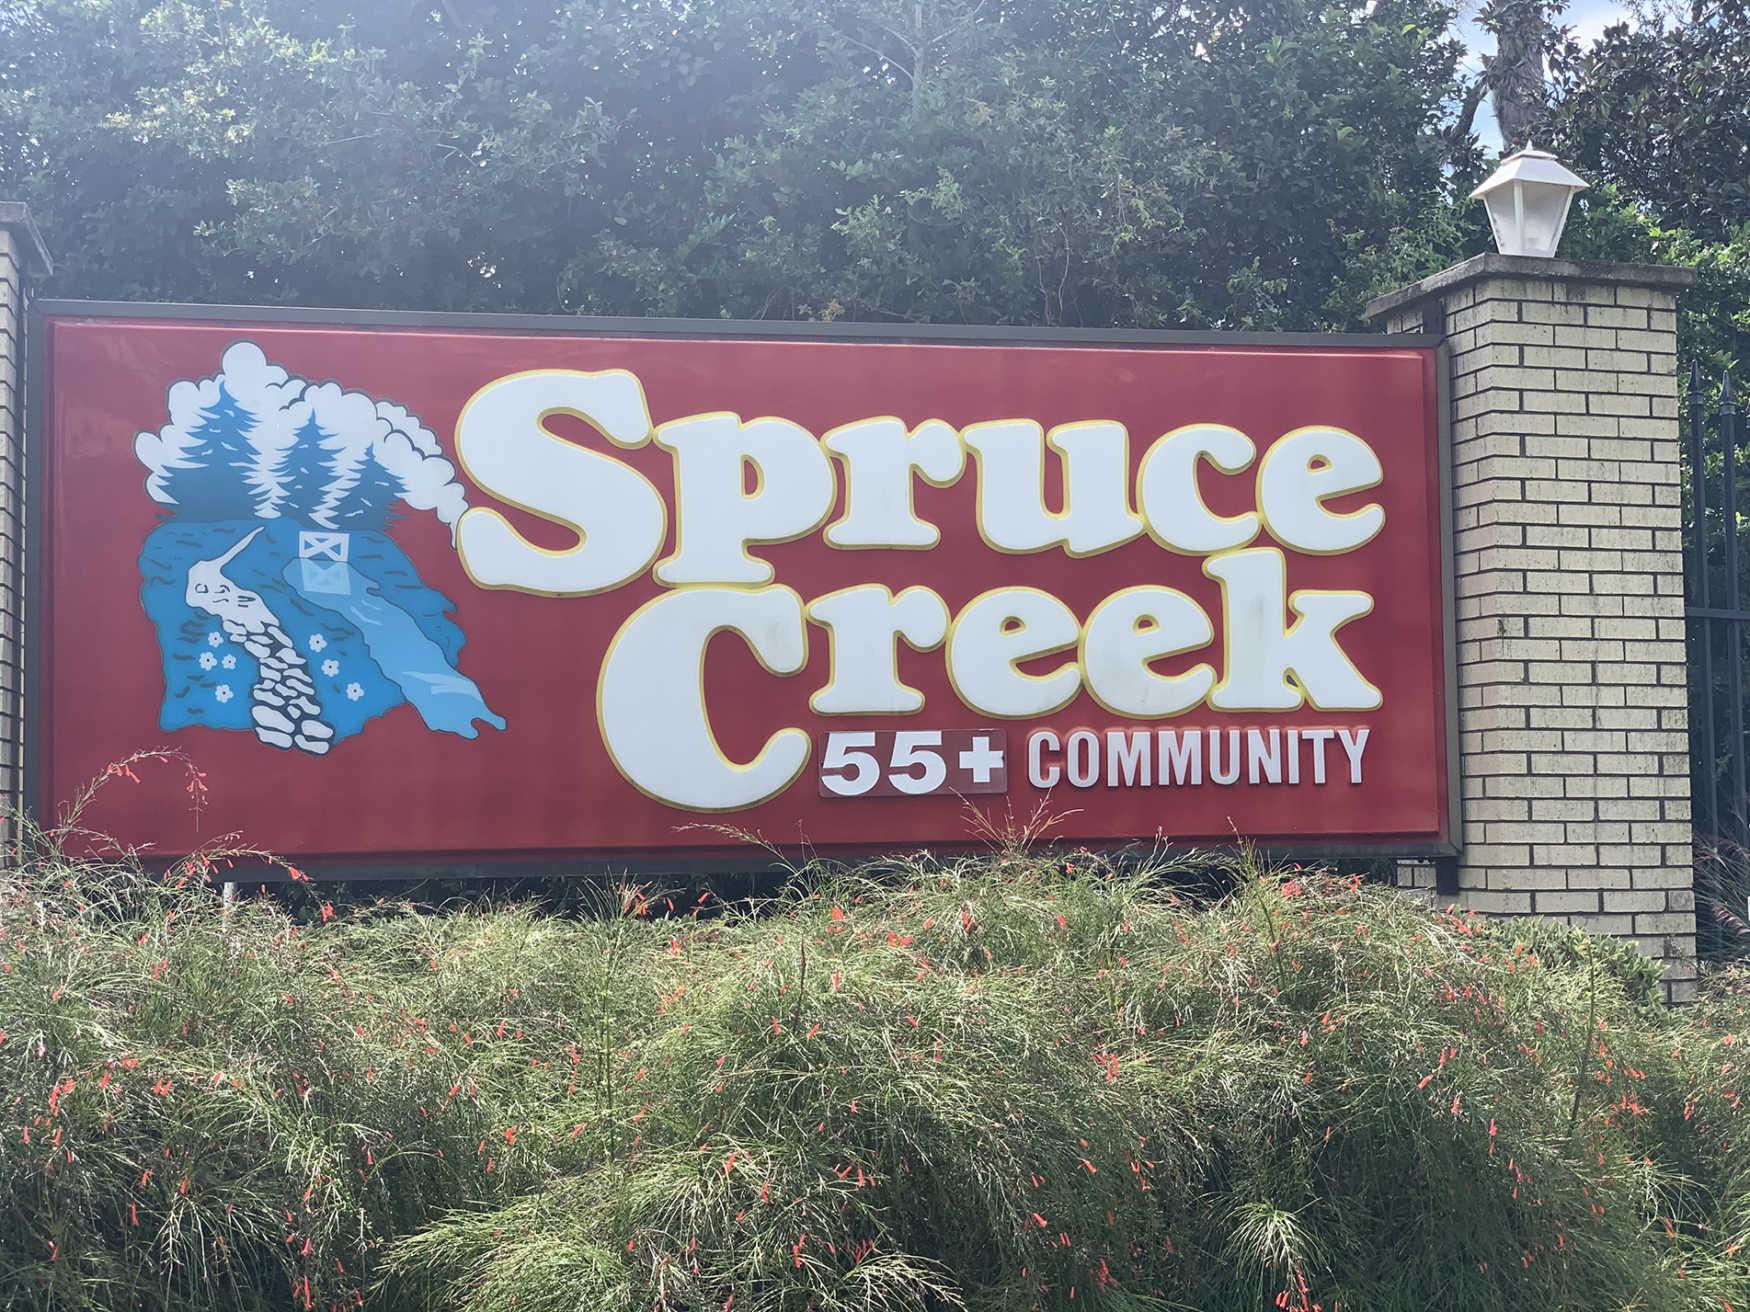 Spruce Creek North community sign